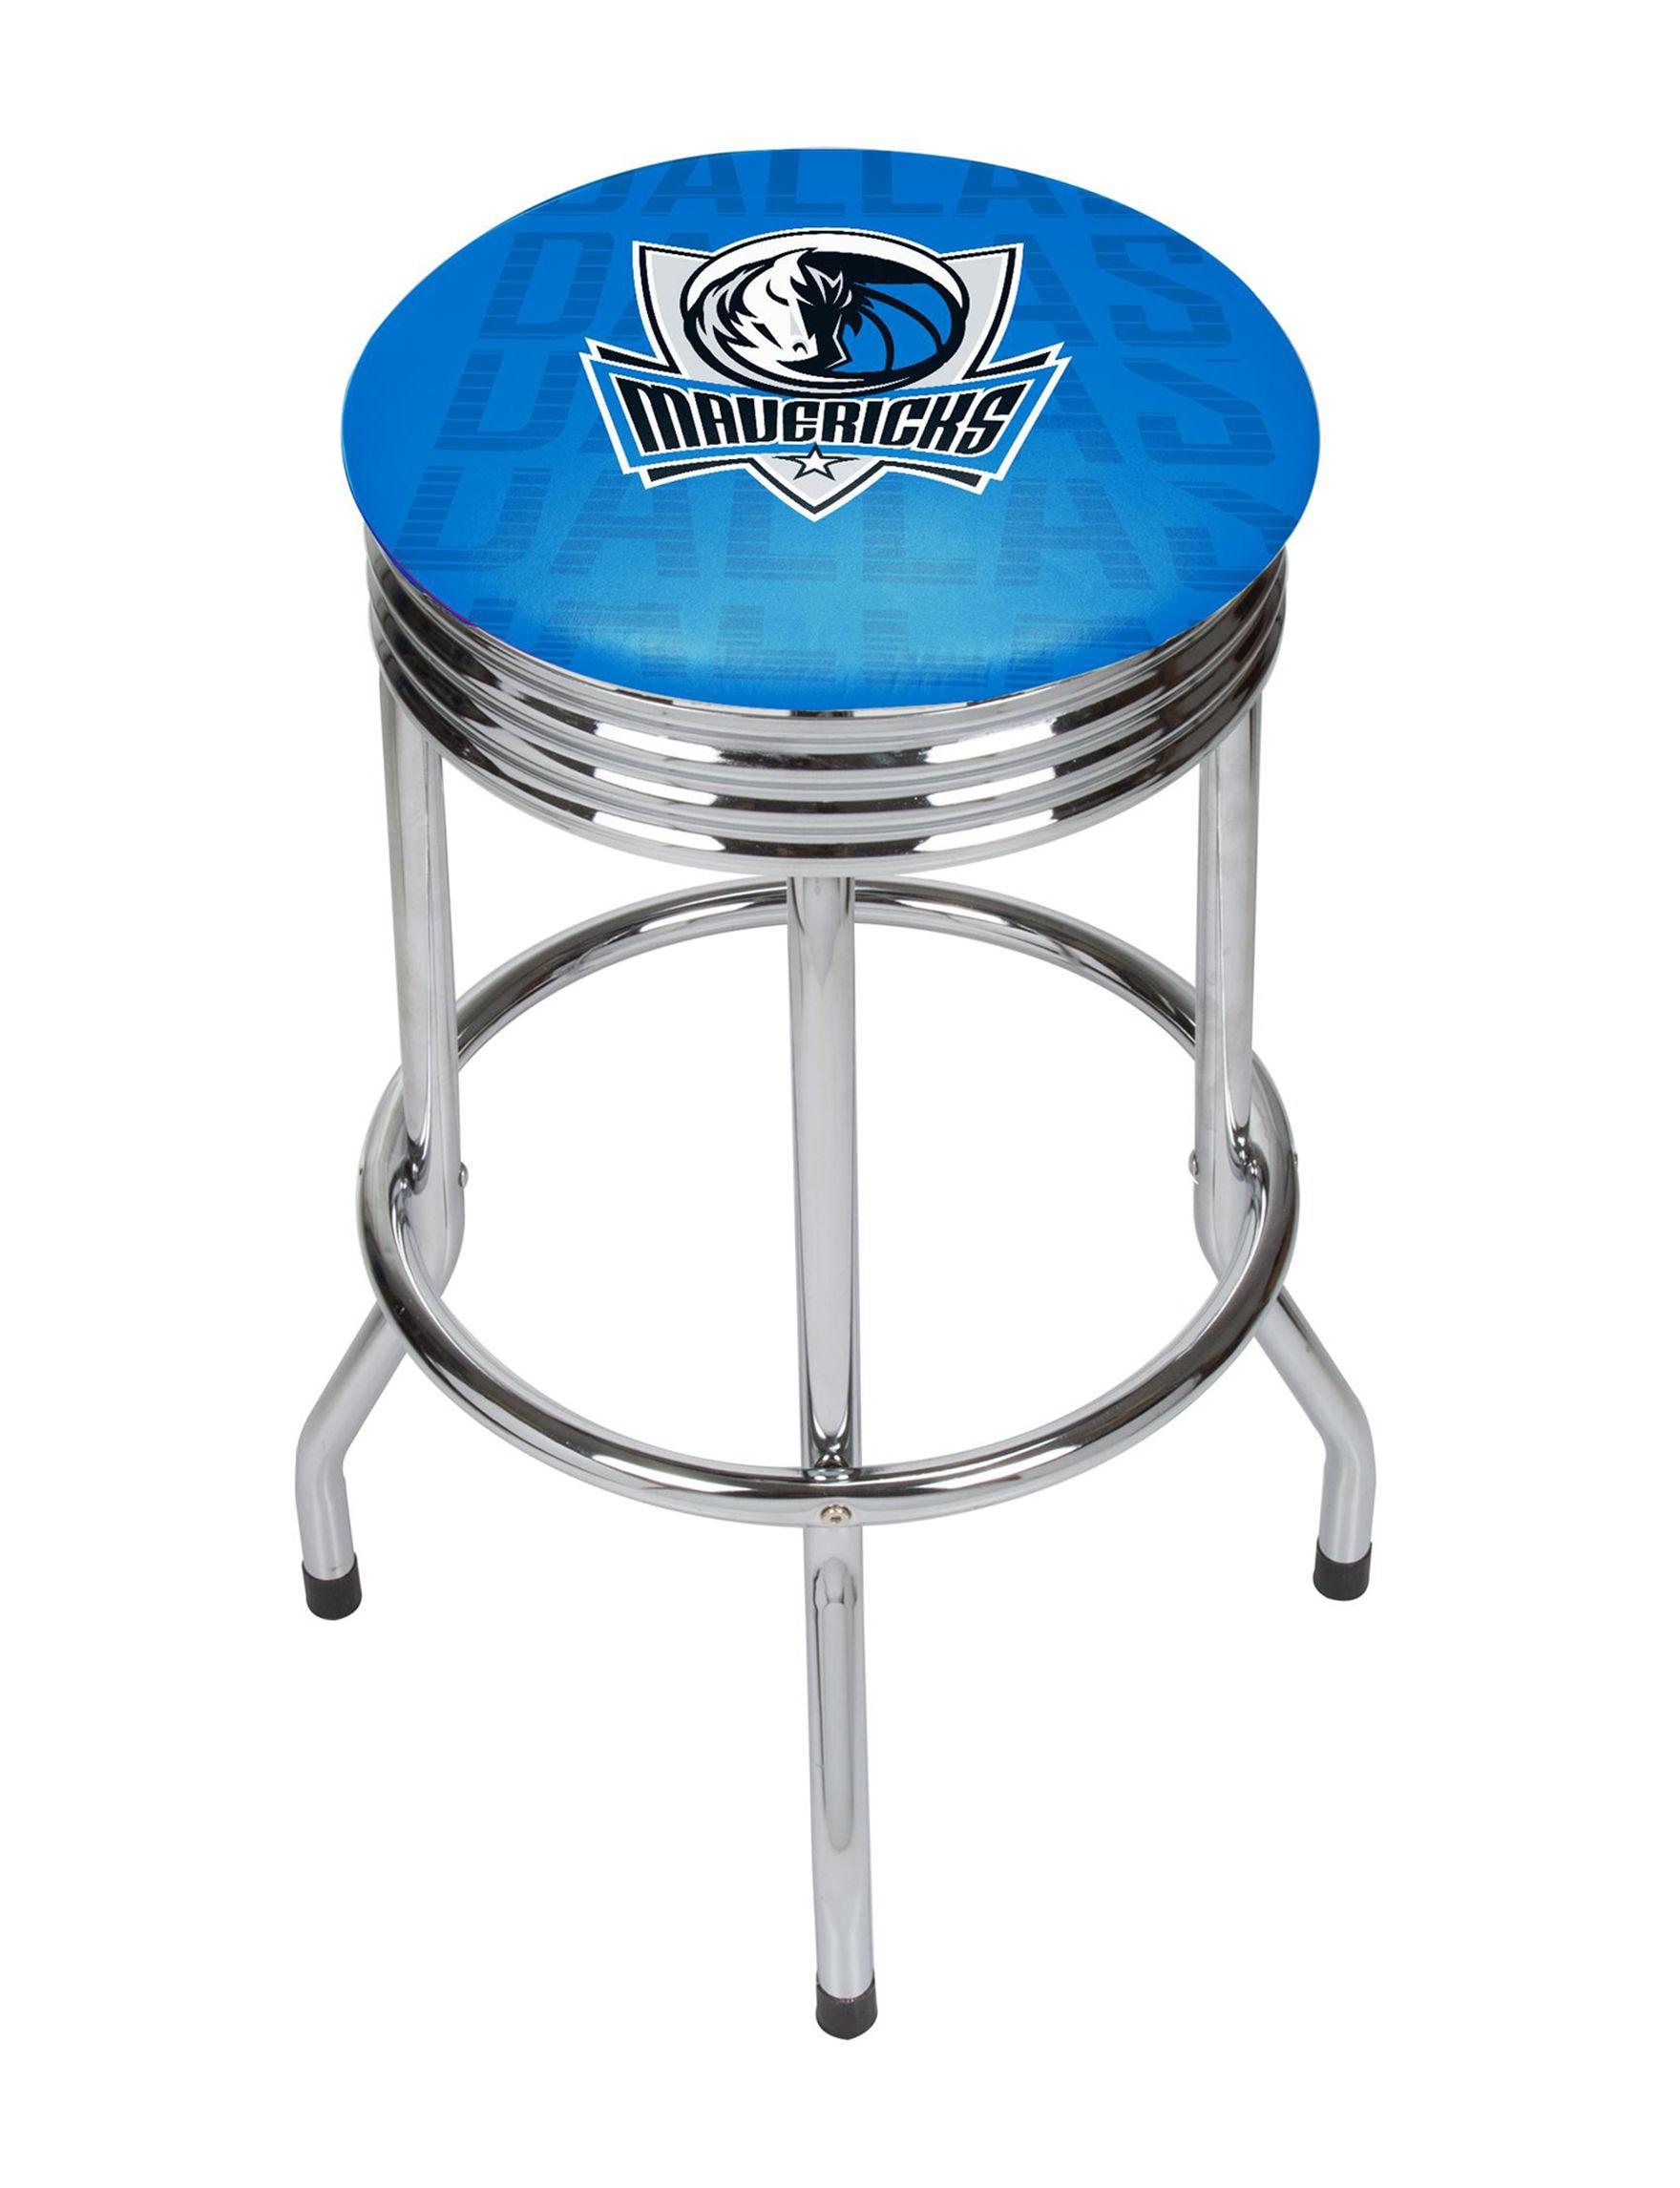 NBA Blue / White Bar & Kitchen Stools Kitchen & Dining Furniture NBA